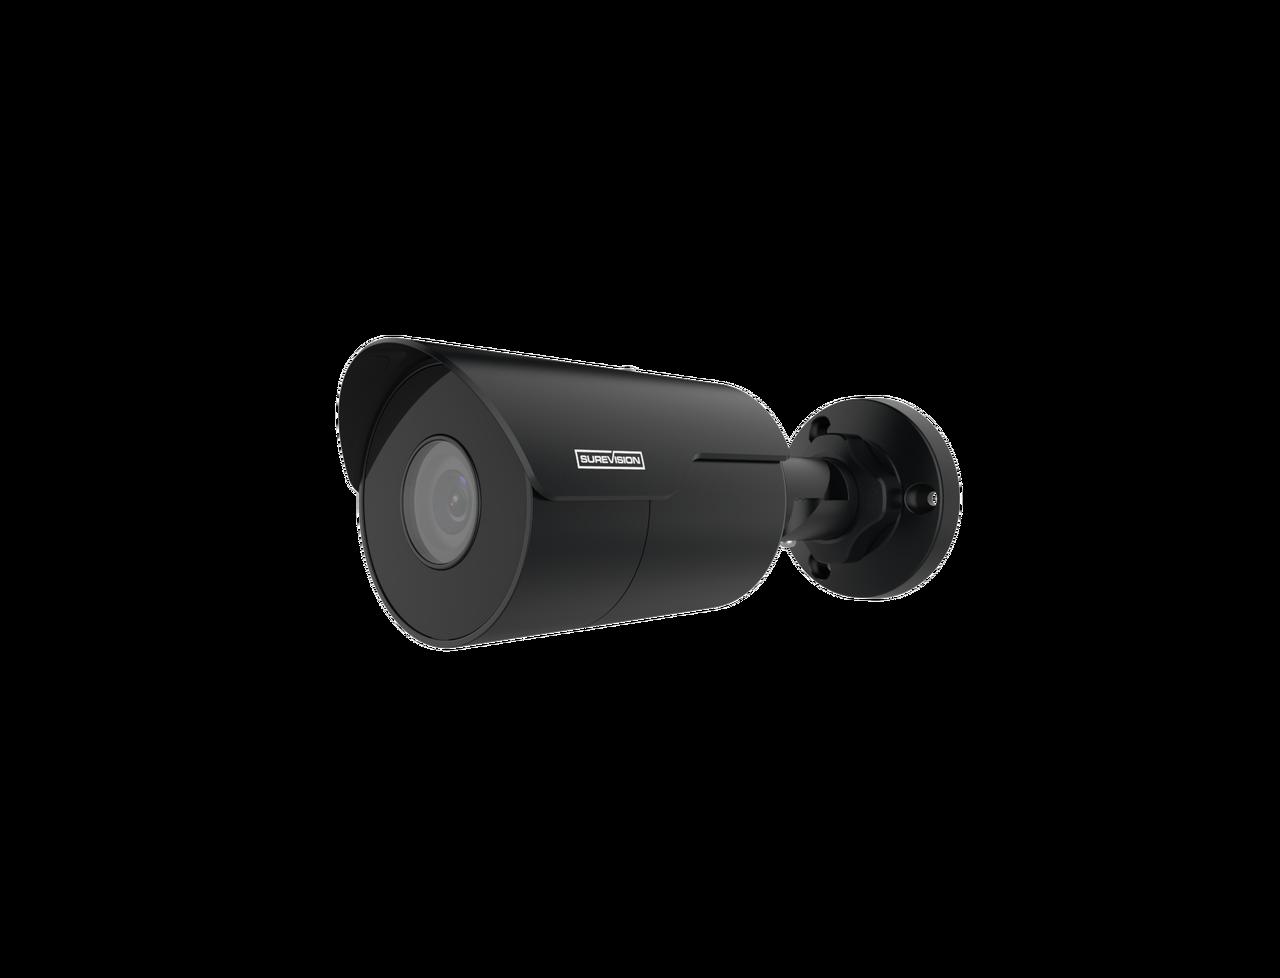 SUREVISION™ 4K Mini Fixed Bullet Network Camera